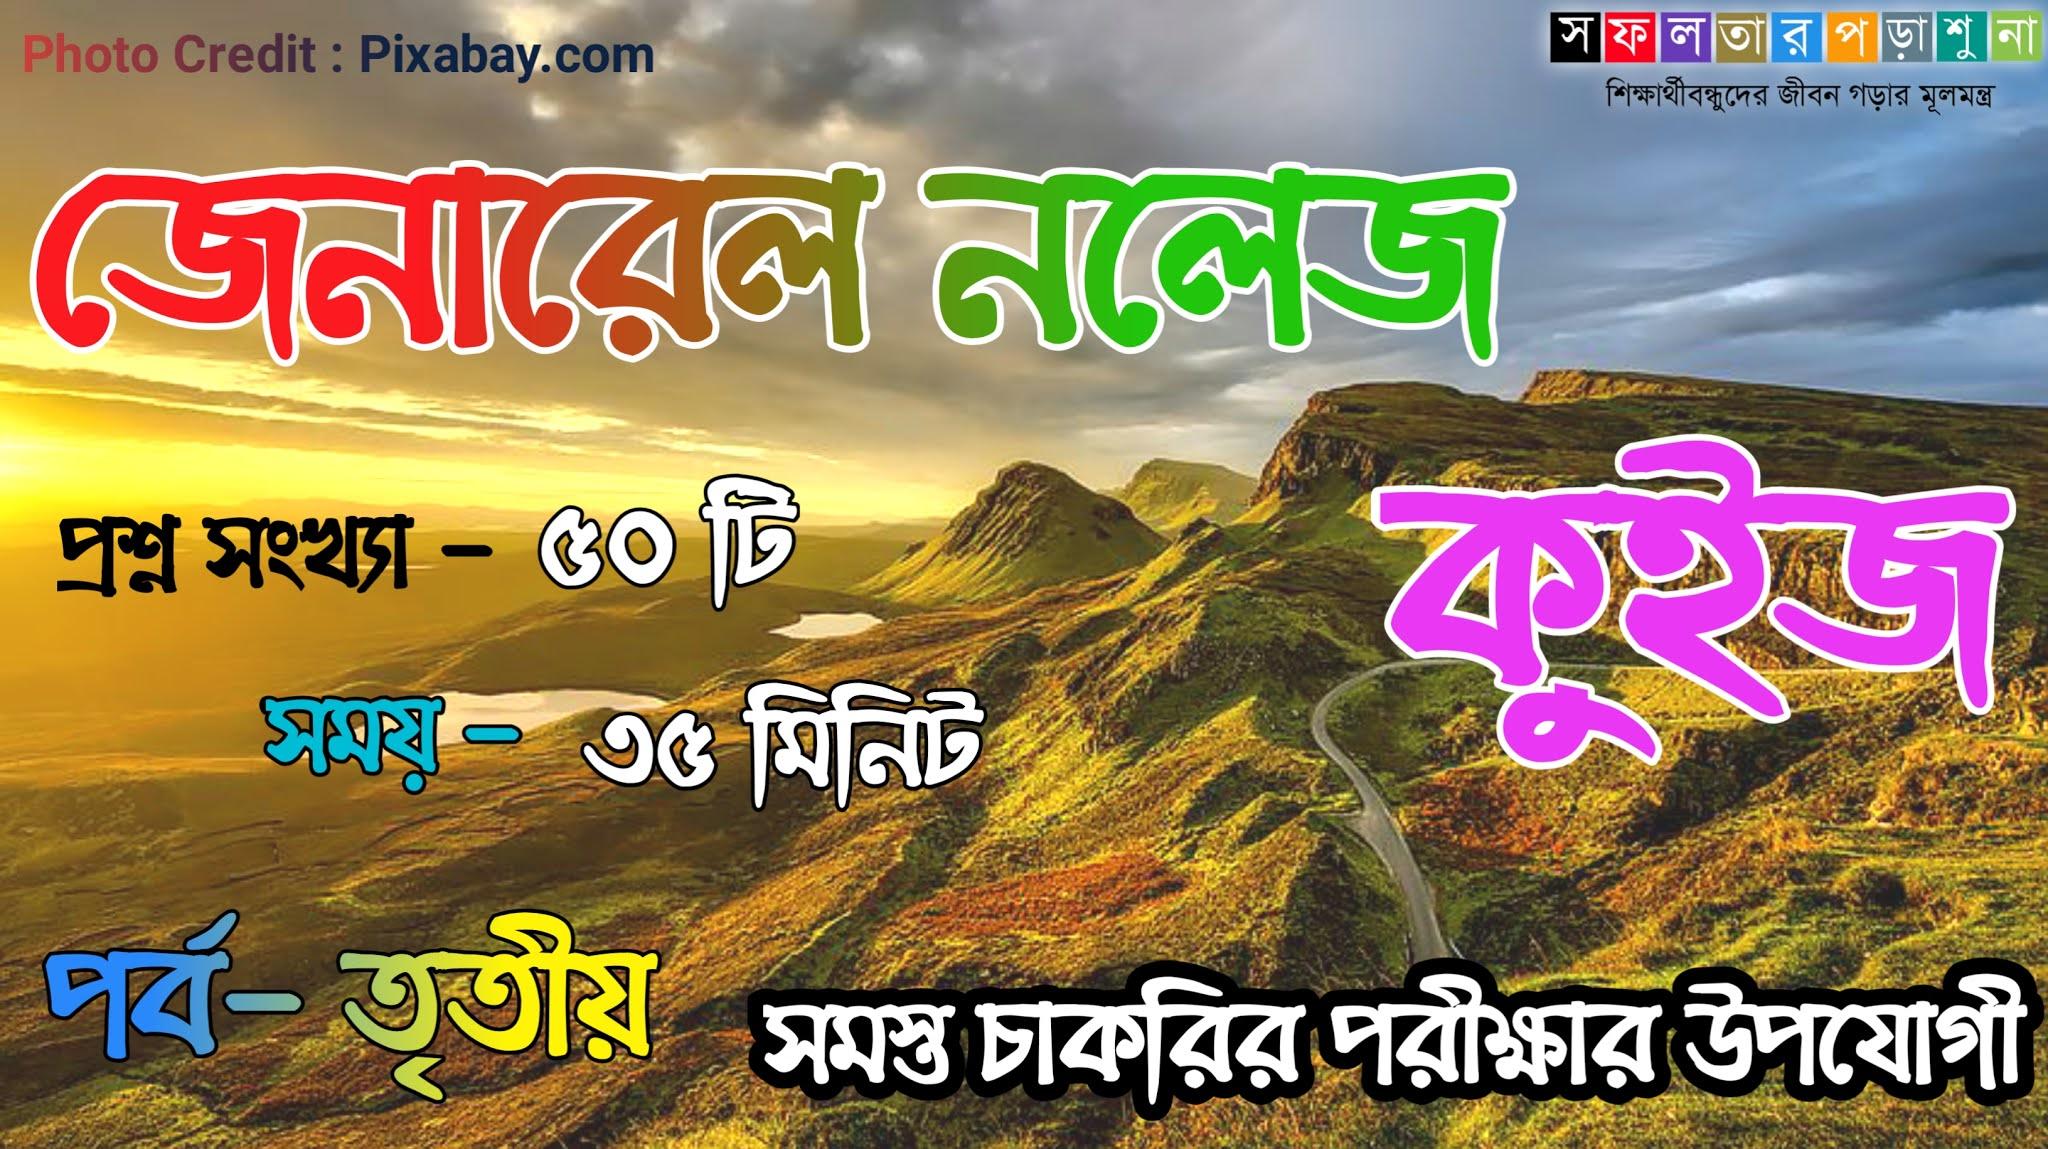 Online Mock Test On General Knowledge In Bengali (Part-3) For All Competitive Exams ।। অনলাইন মকটেস্ট - জেনারেল নলেজ